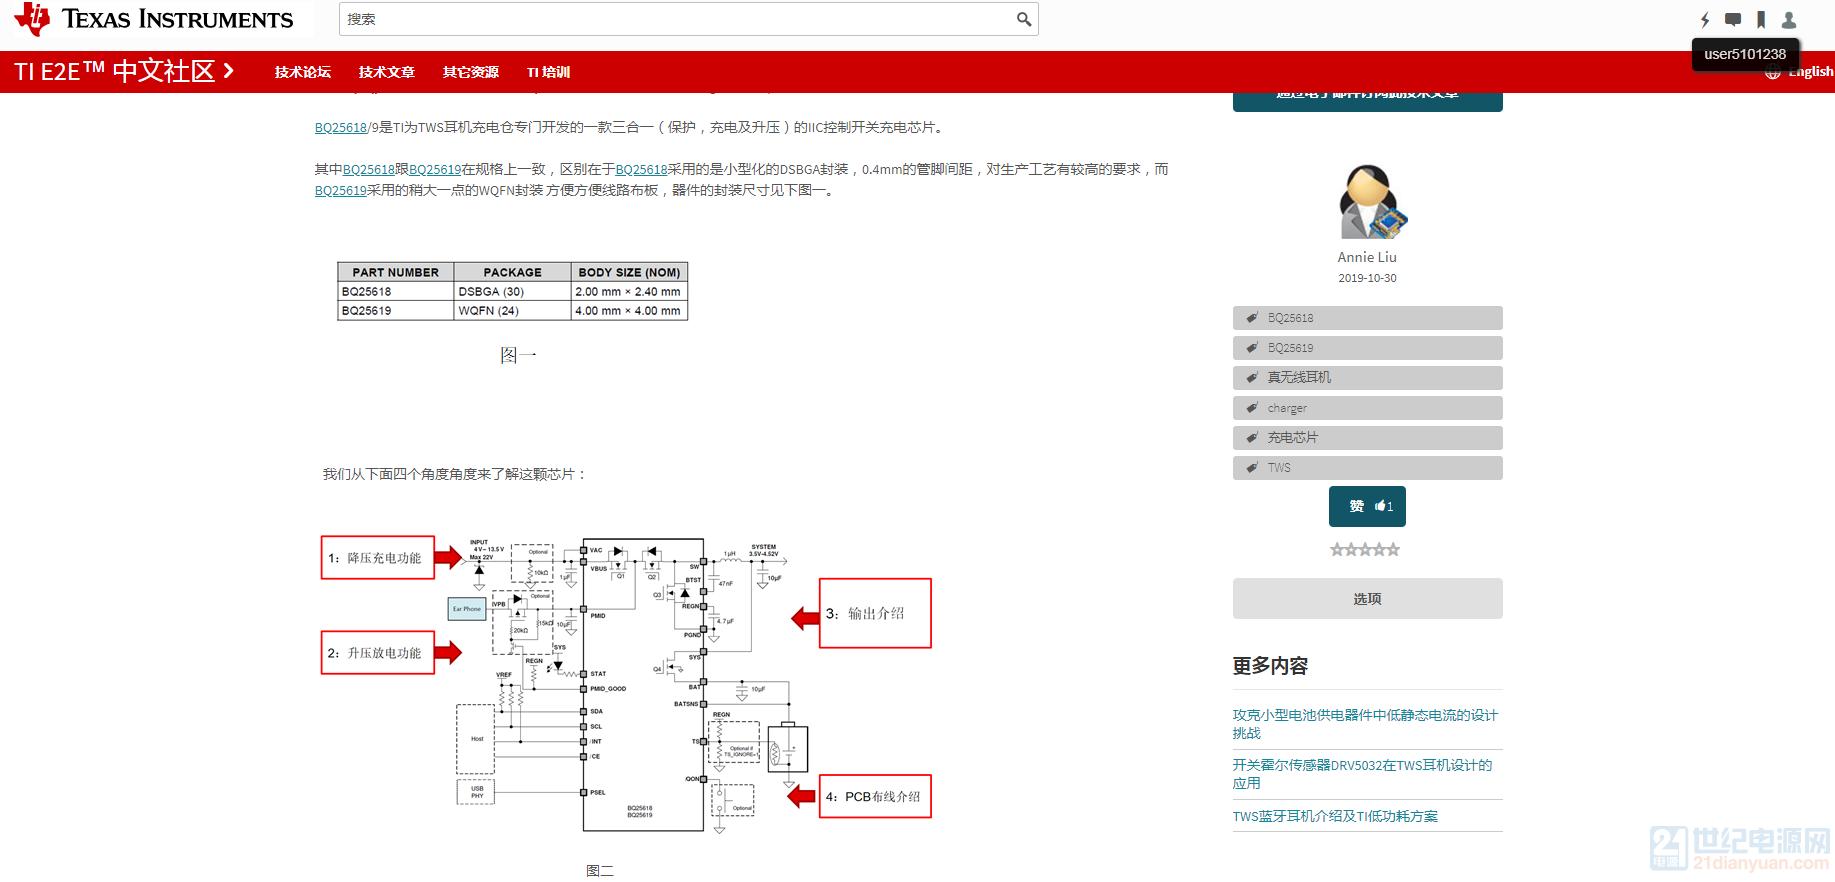 TWS真无线耳机充电仓专用开关充电芯片BQ256189详解.png